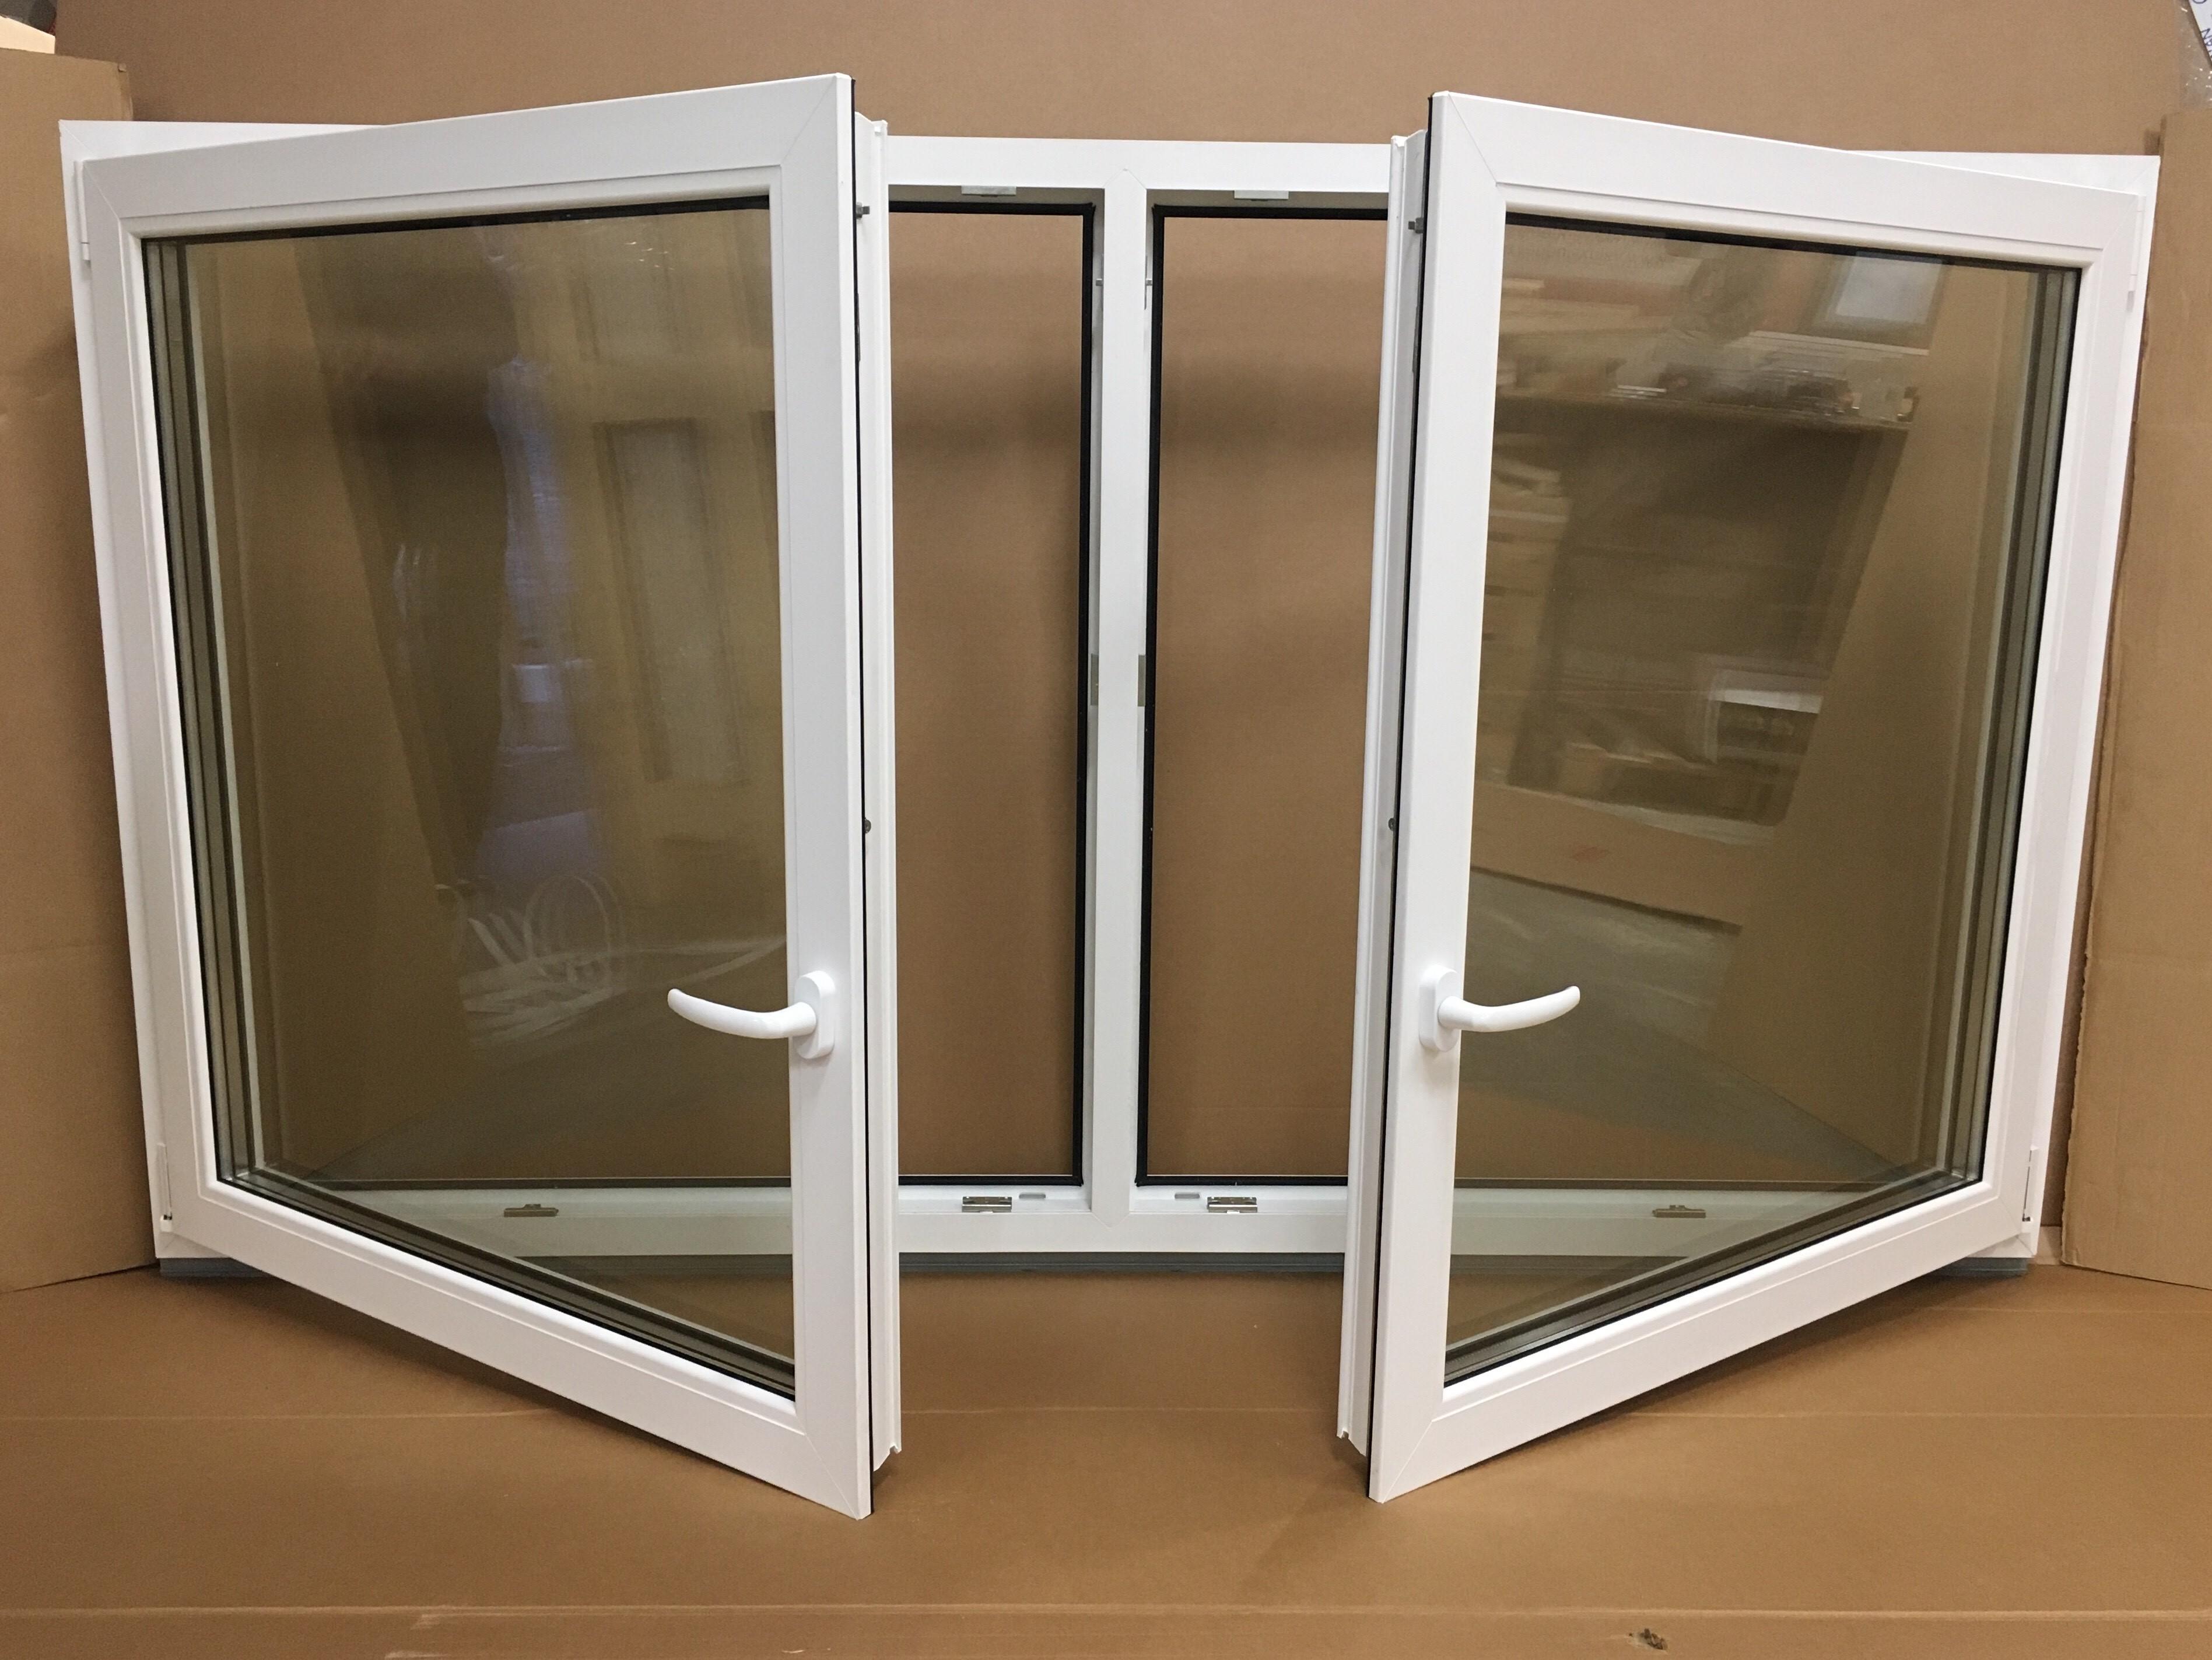 Pvc Window With 2 Opening Parts Jonas Vinduer